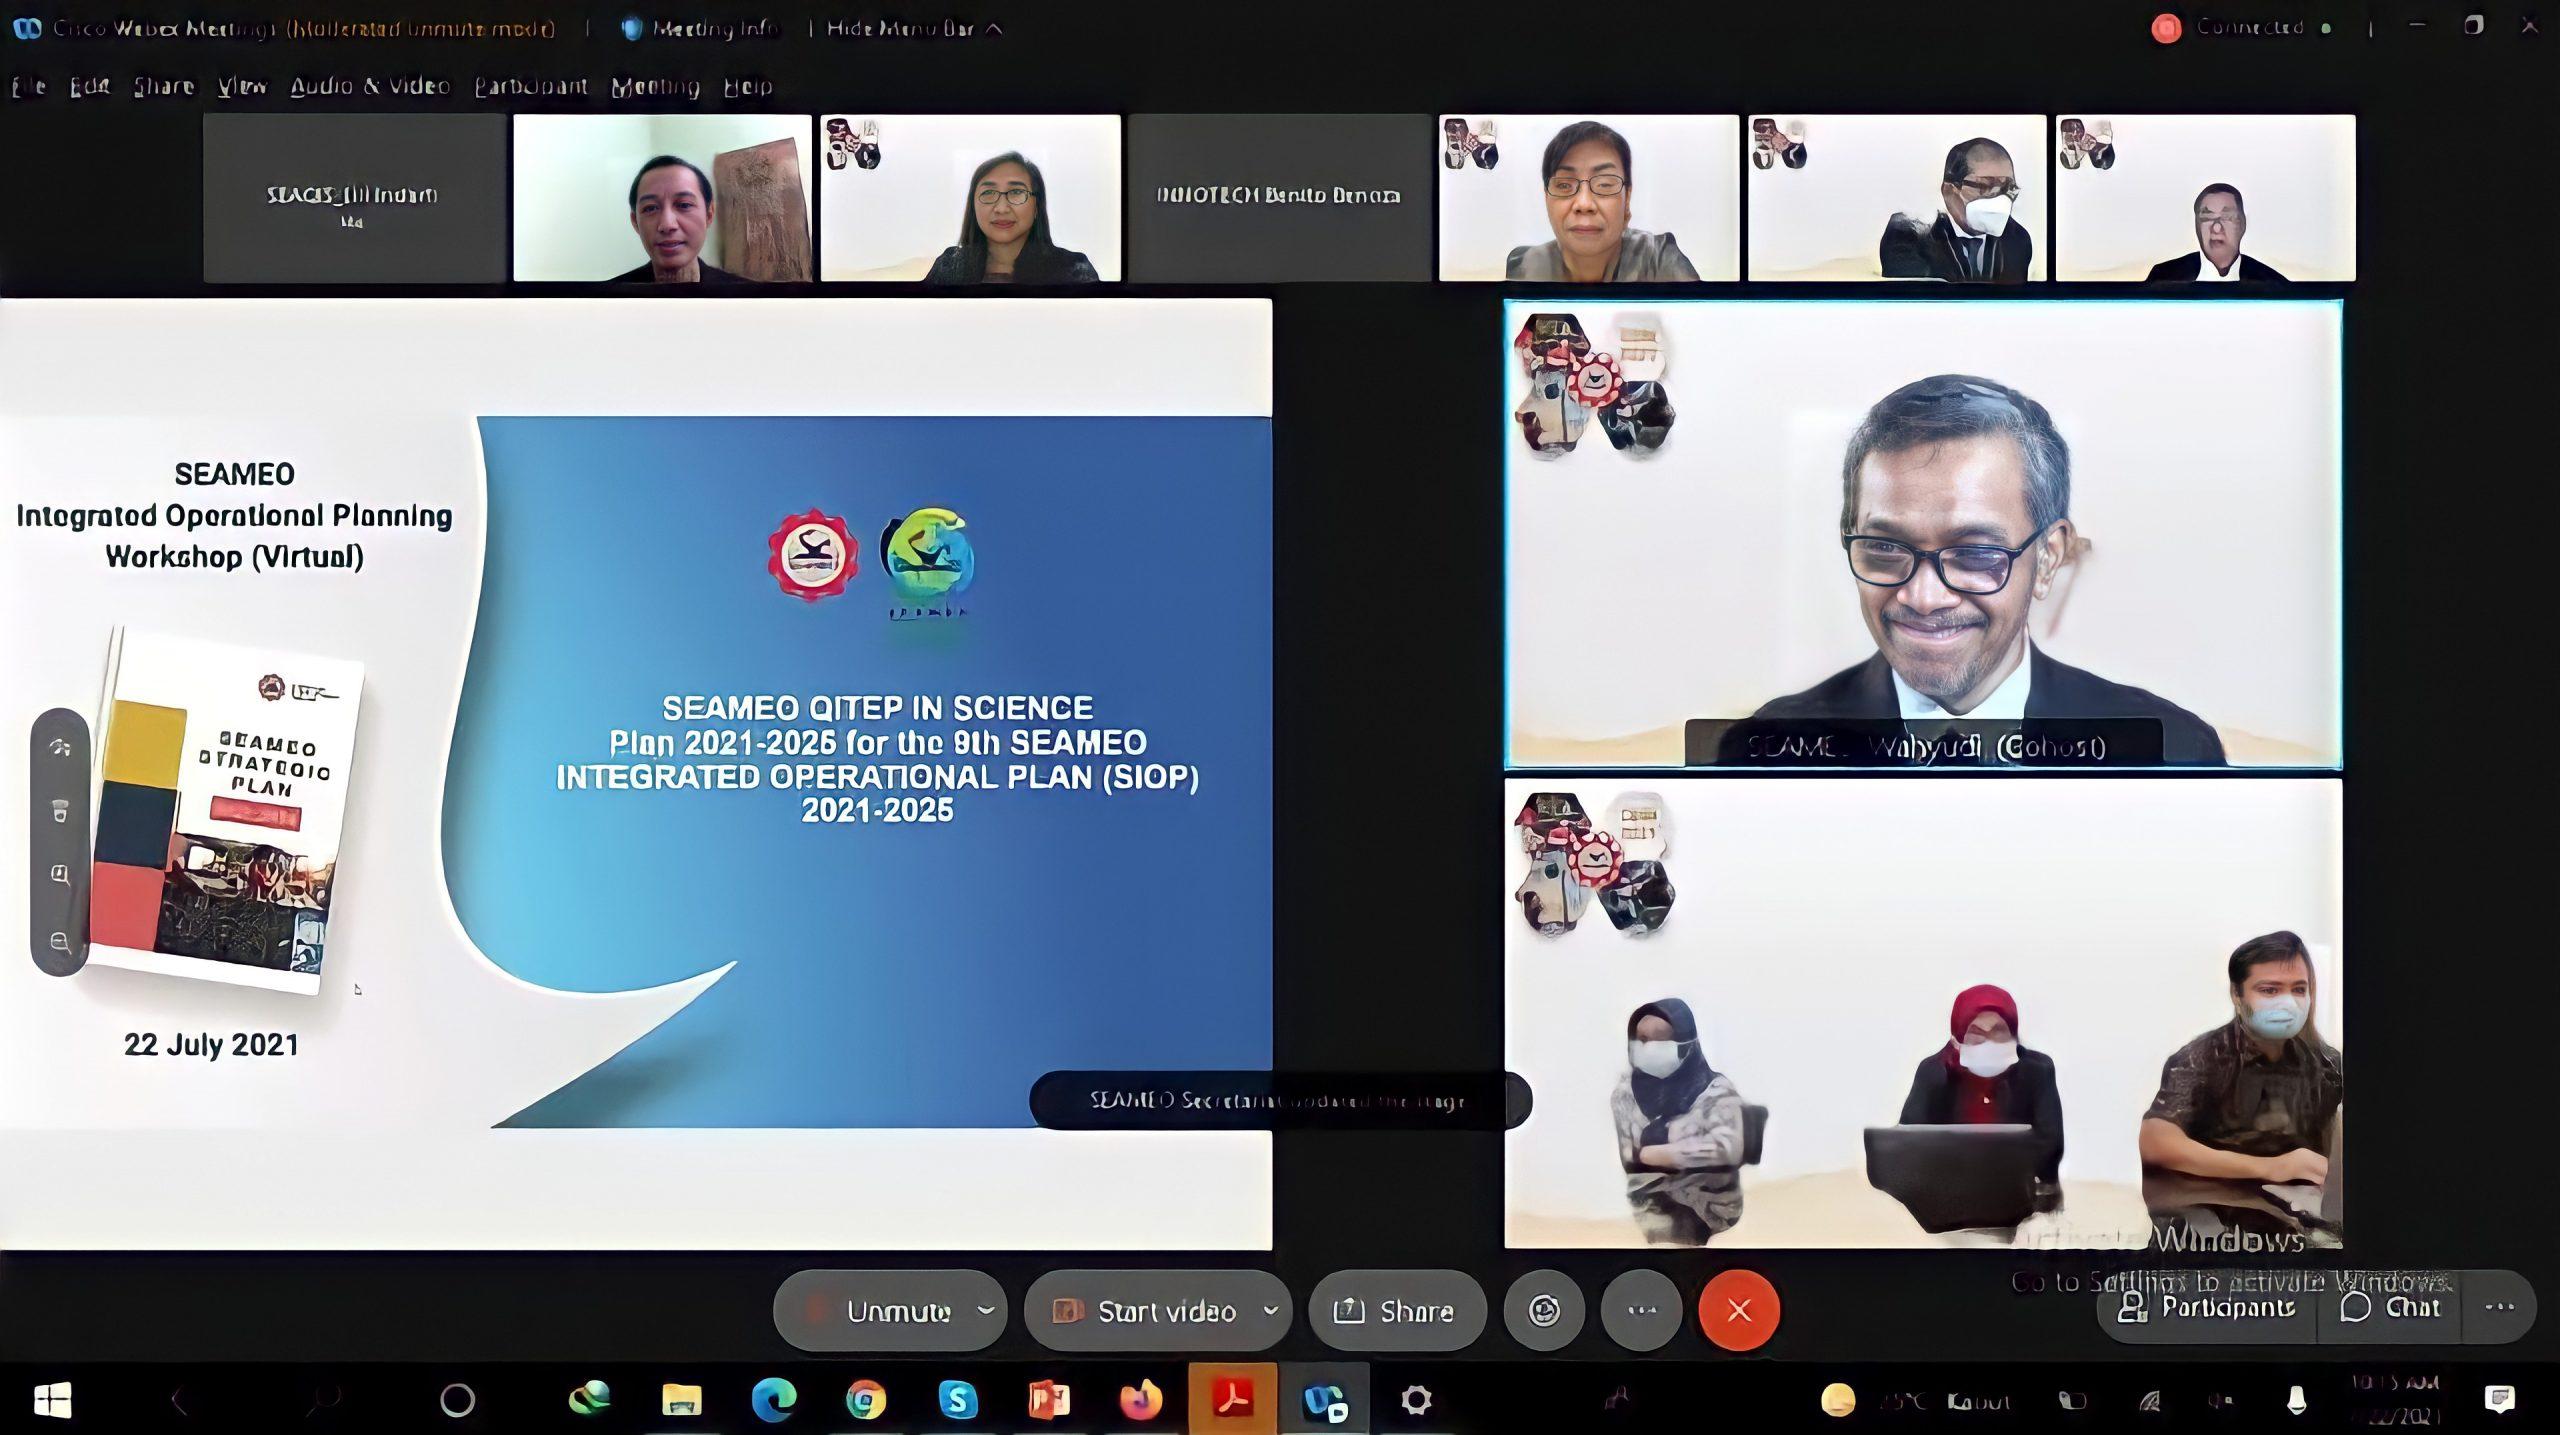 SEAMEO Center Directors Meeting (CDM)